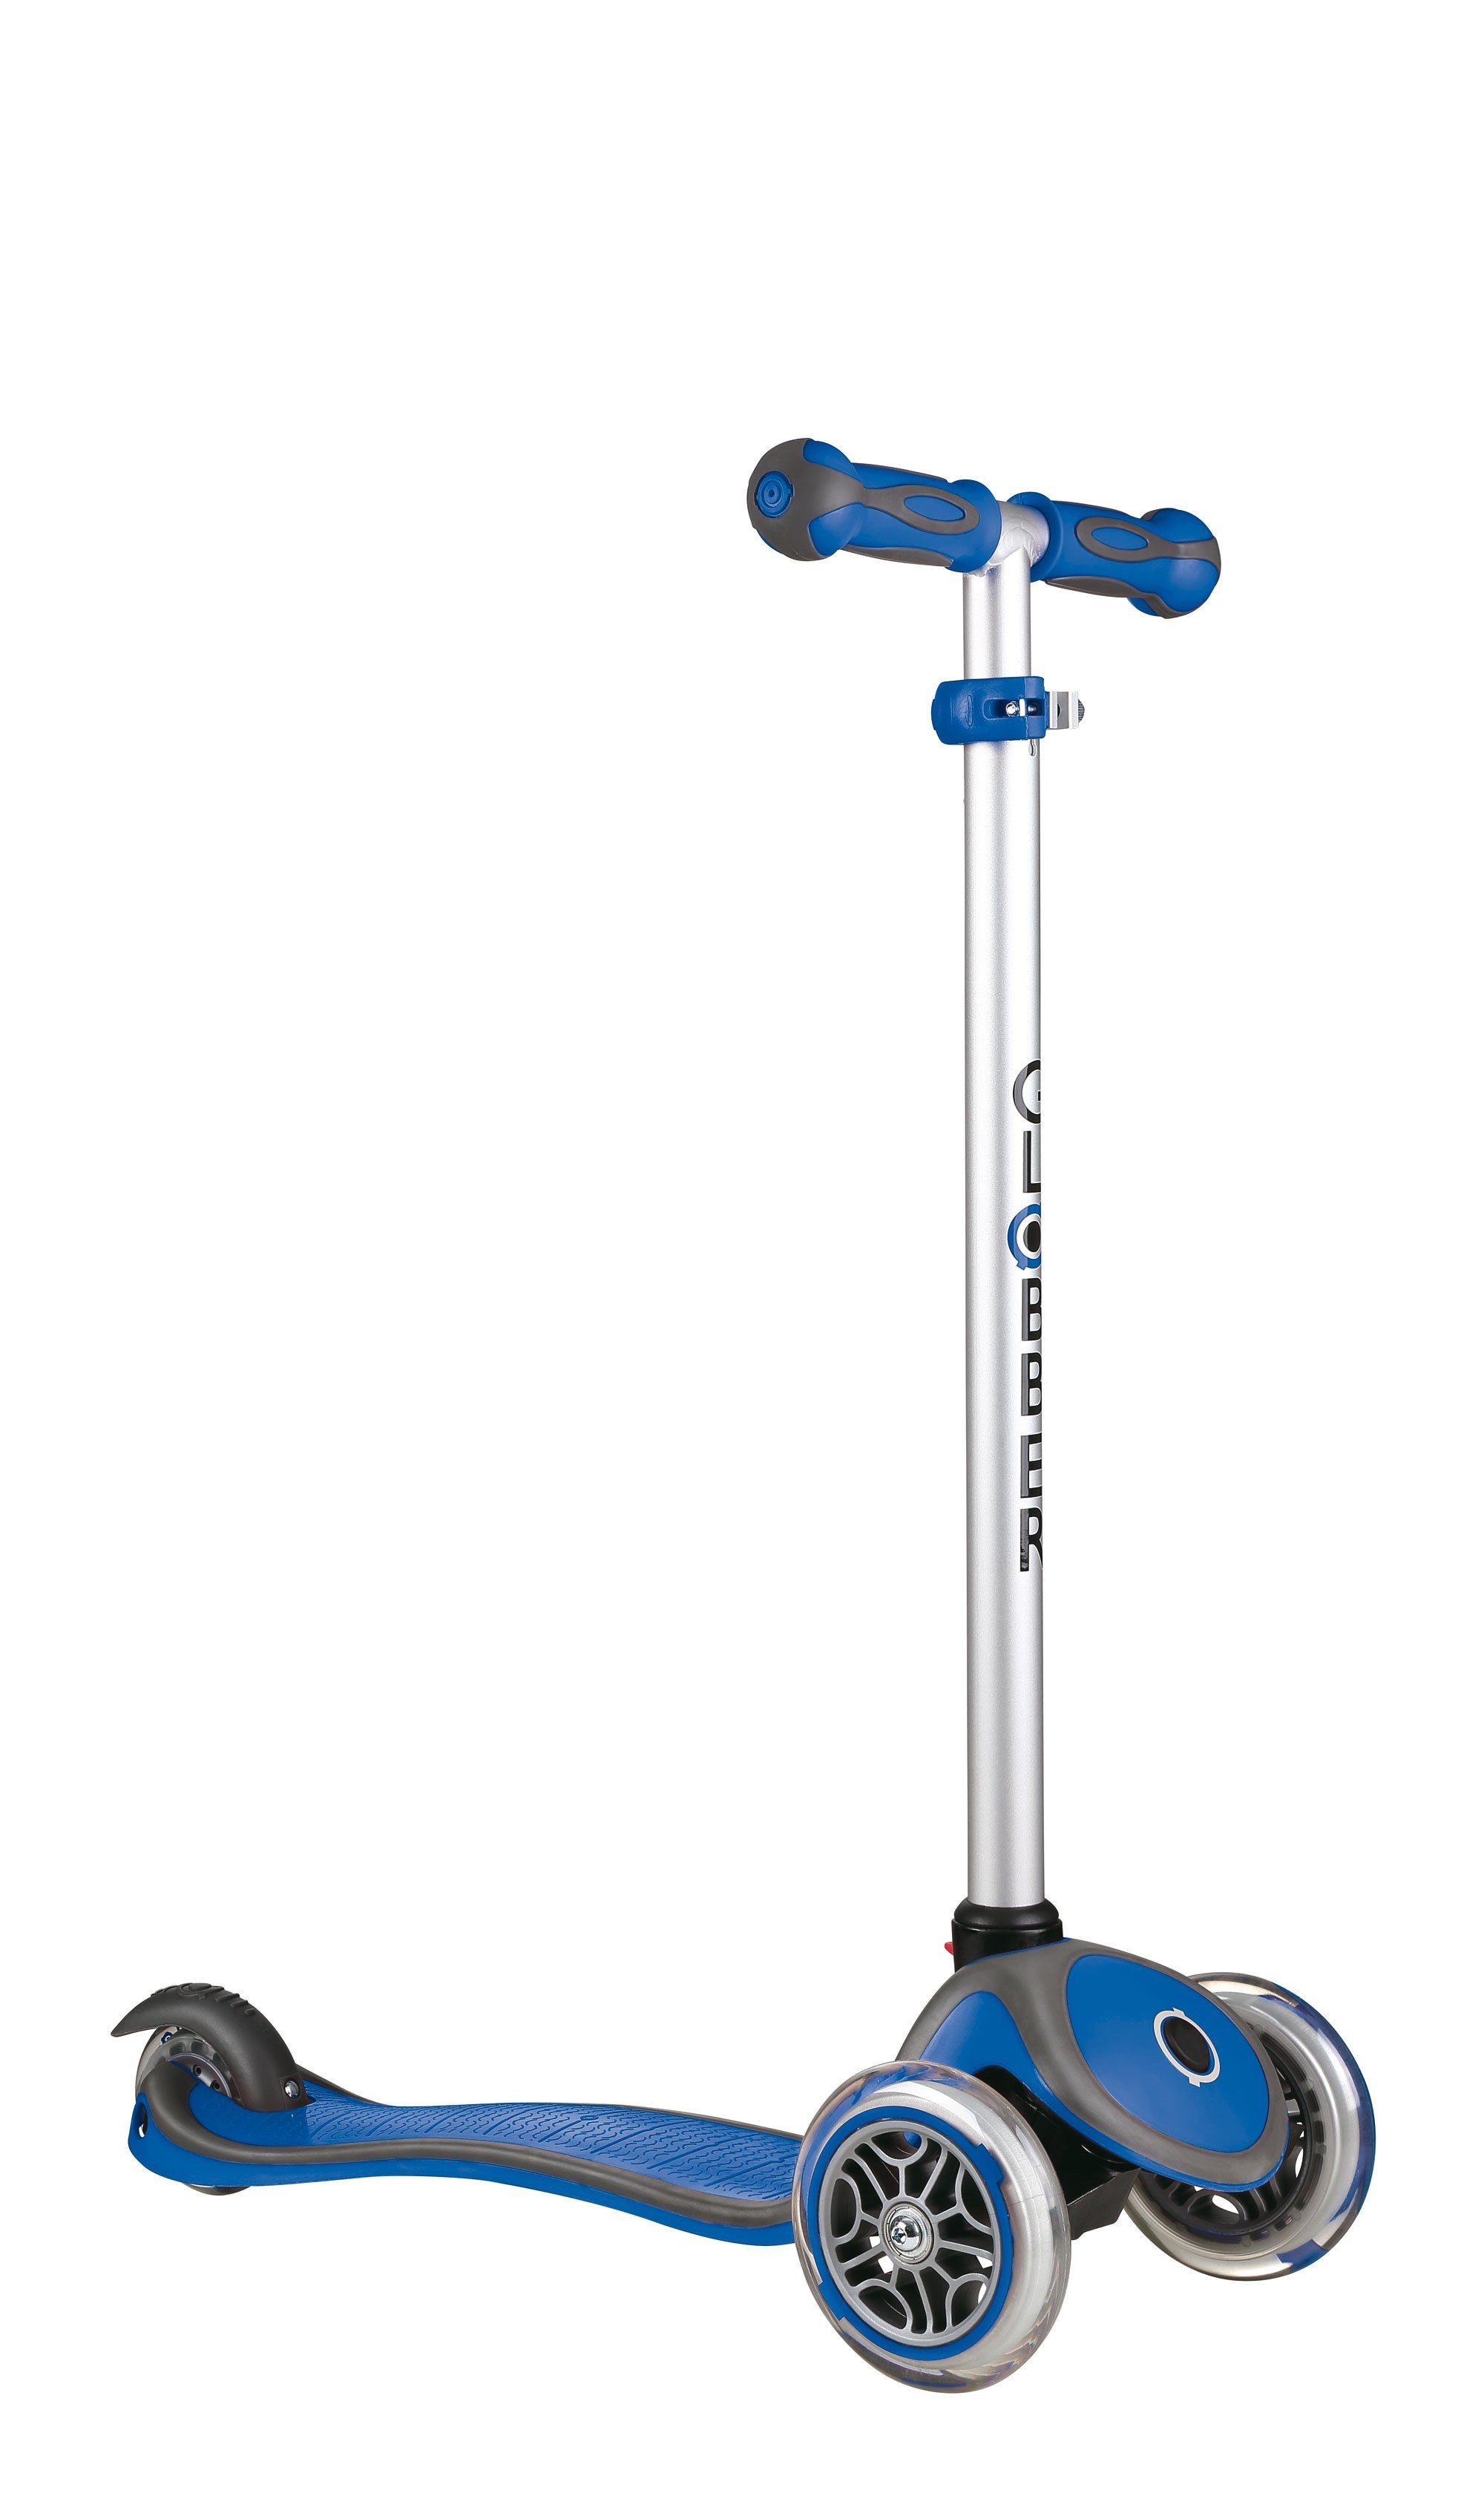 Scooter Kinderroller Dreirad Laufrad Globber Evo Comfort 5in1 blau Bild 2